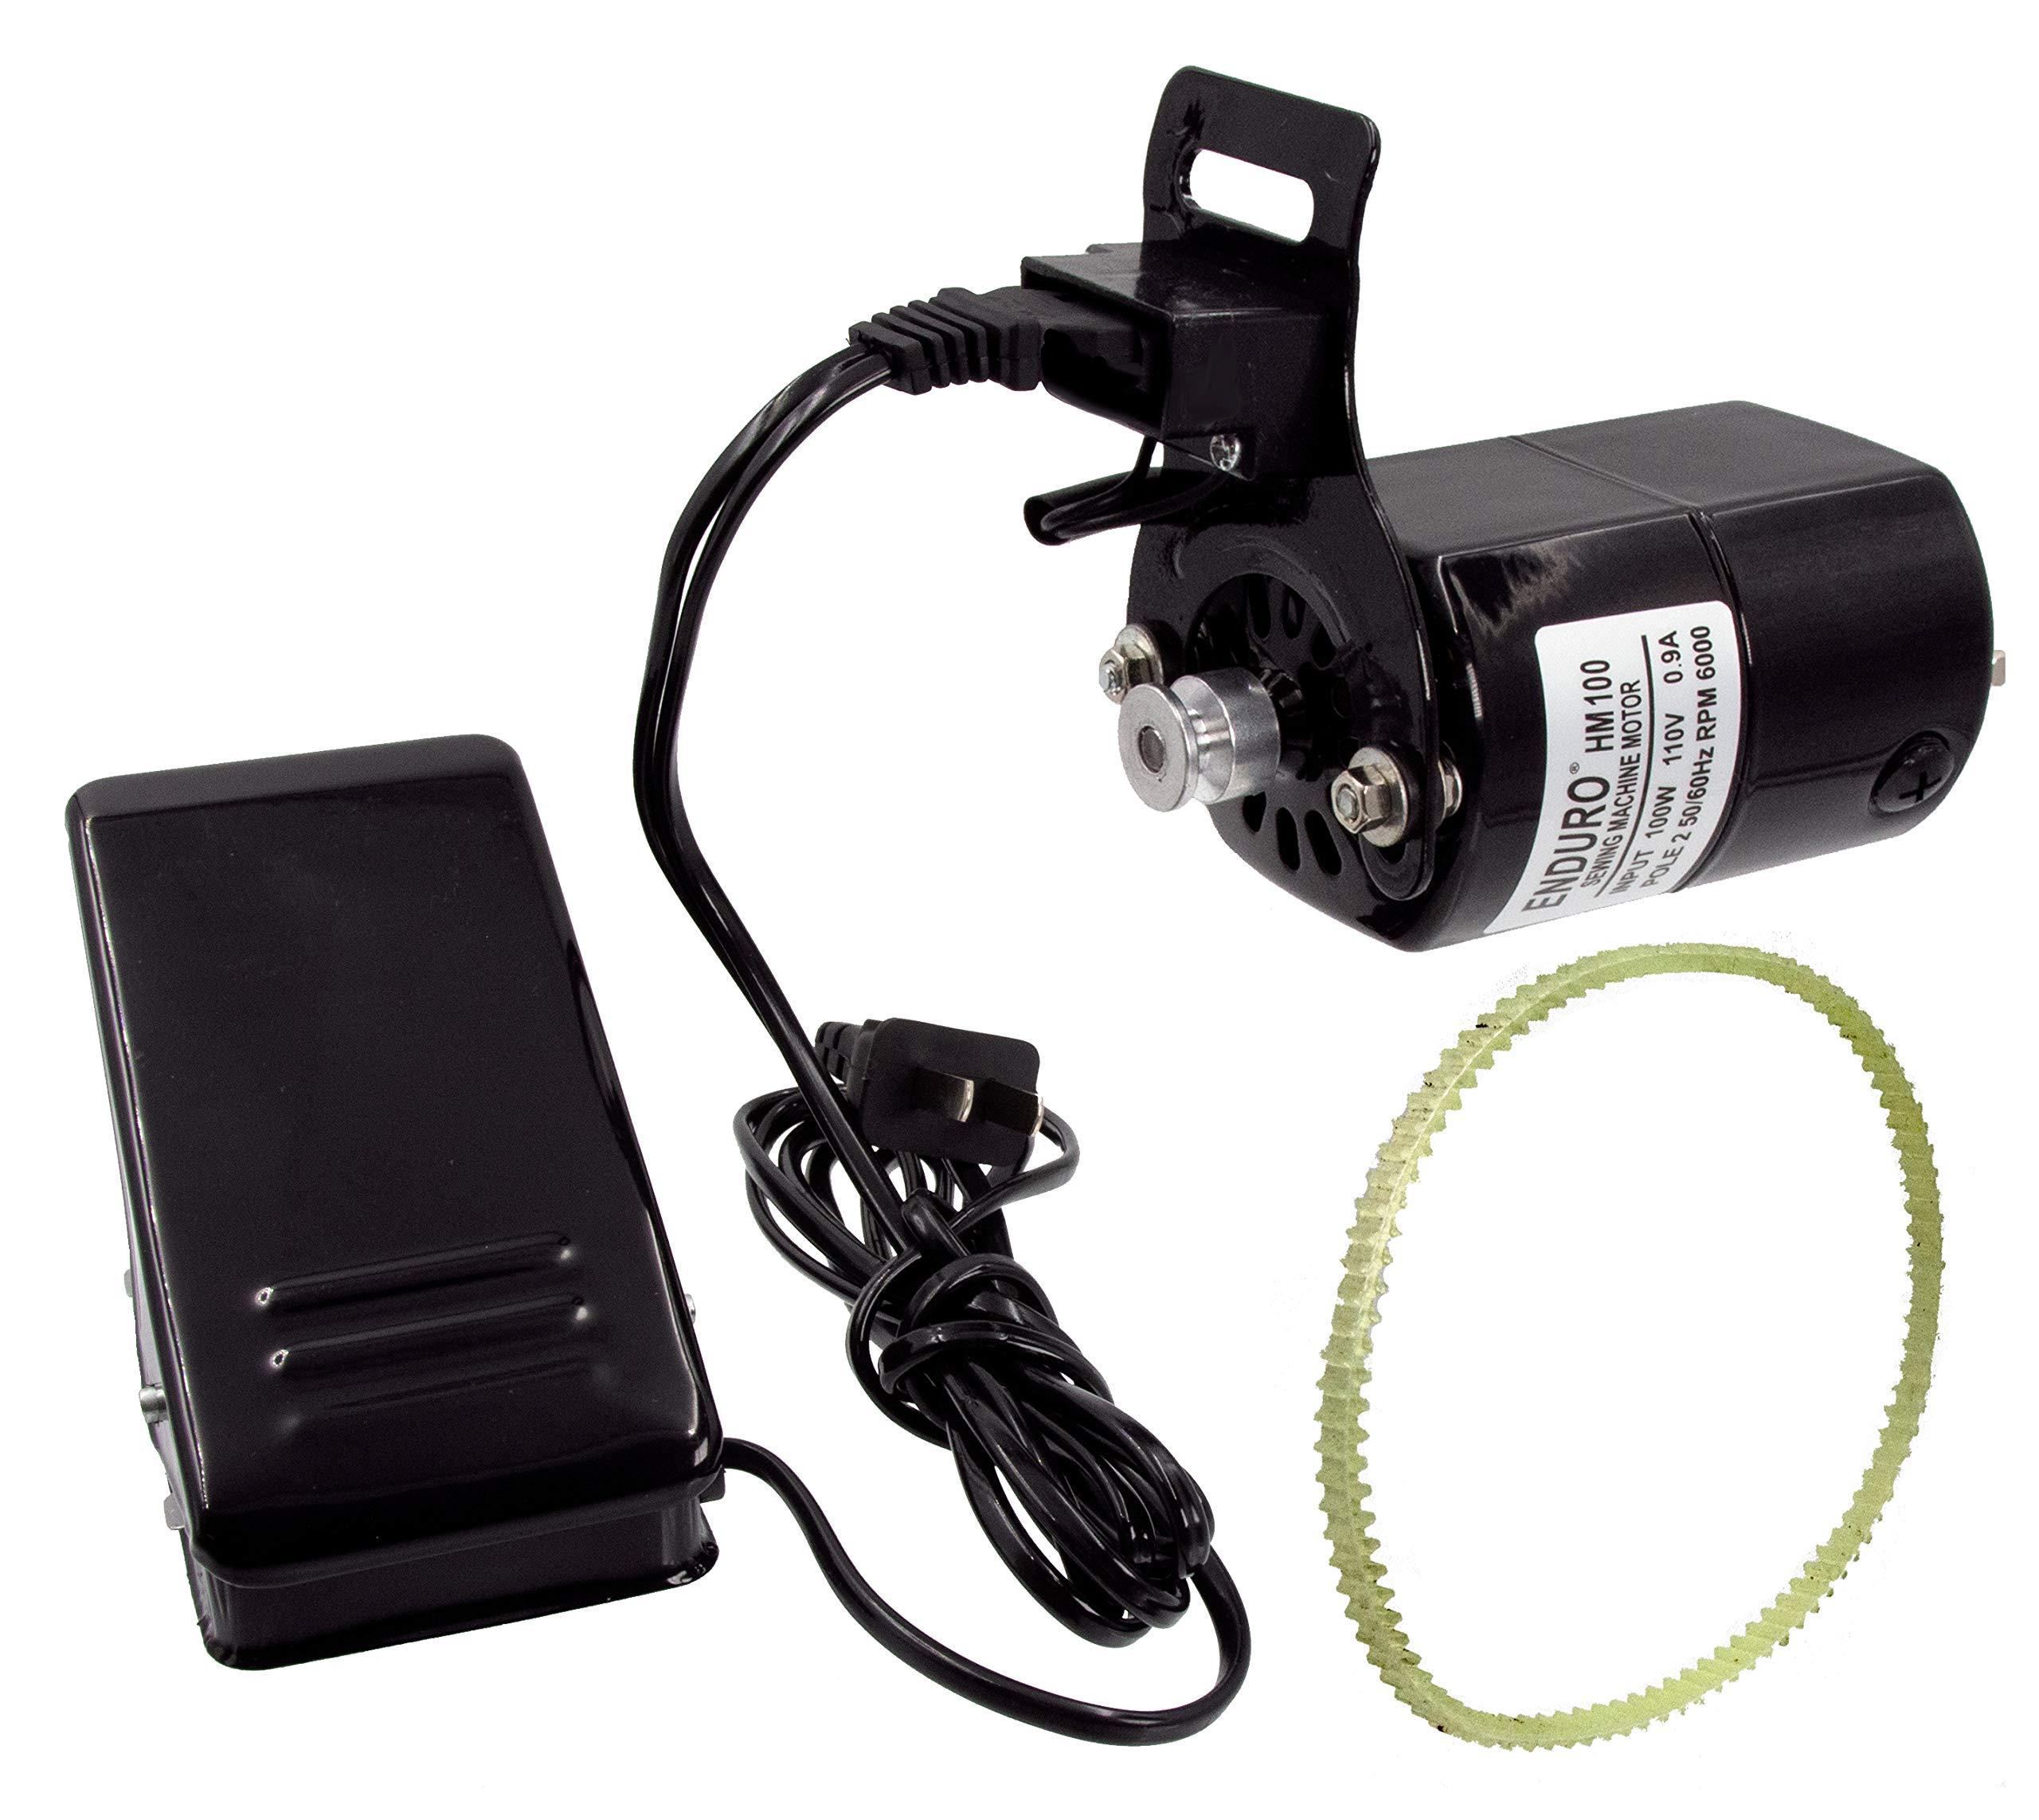 Enduro Sewing Machine Motor Kit w/Foot Pedal & Belt - 110 Volt, 100 Watt for Home Sewing Machines by Enduro